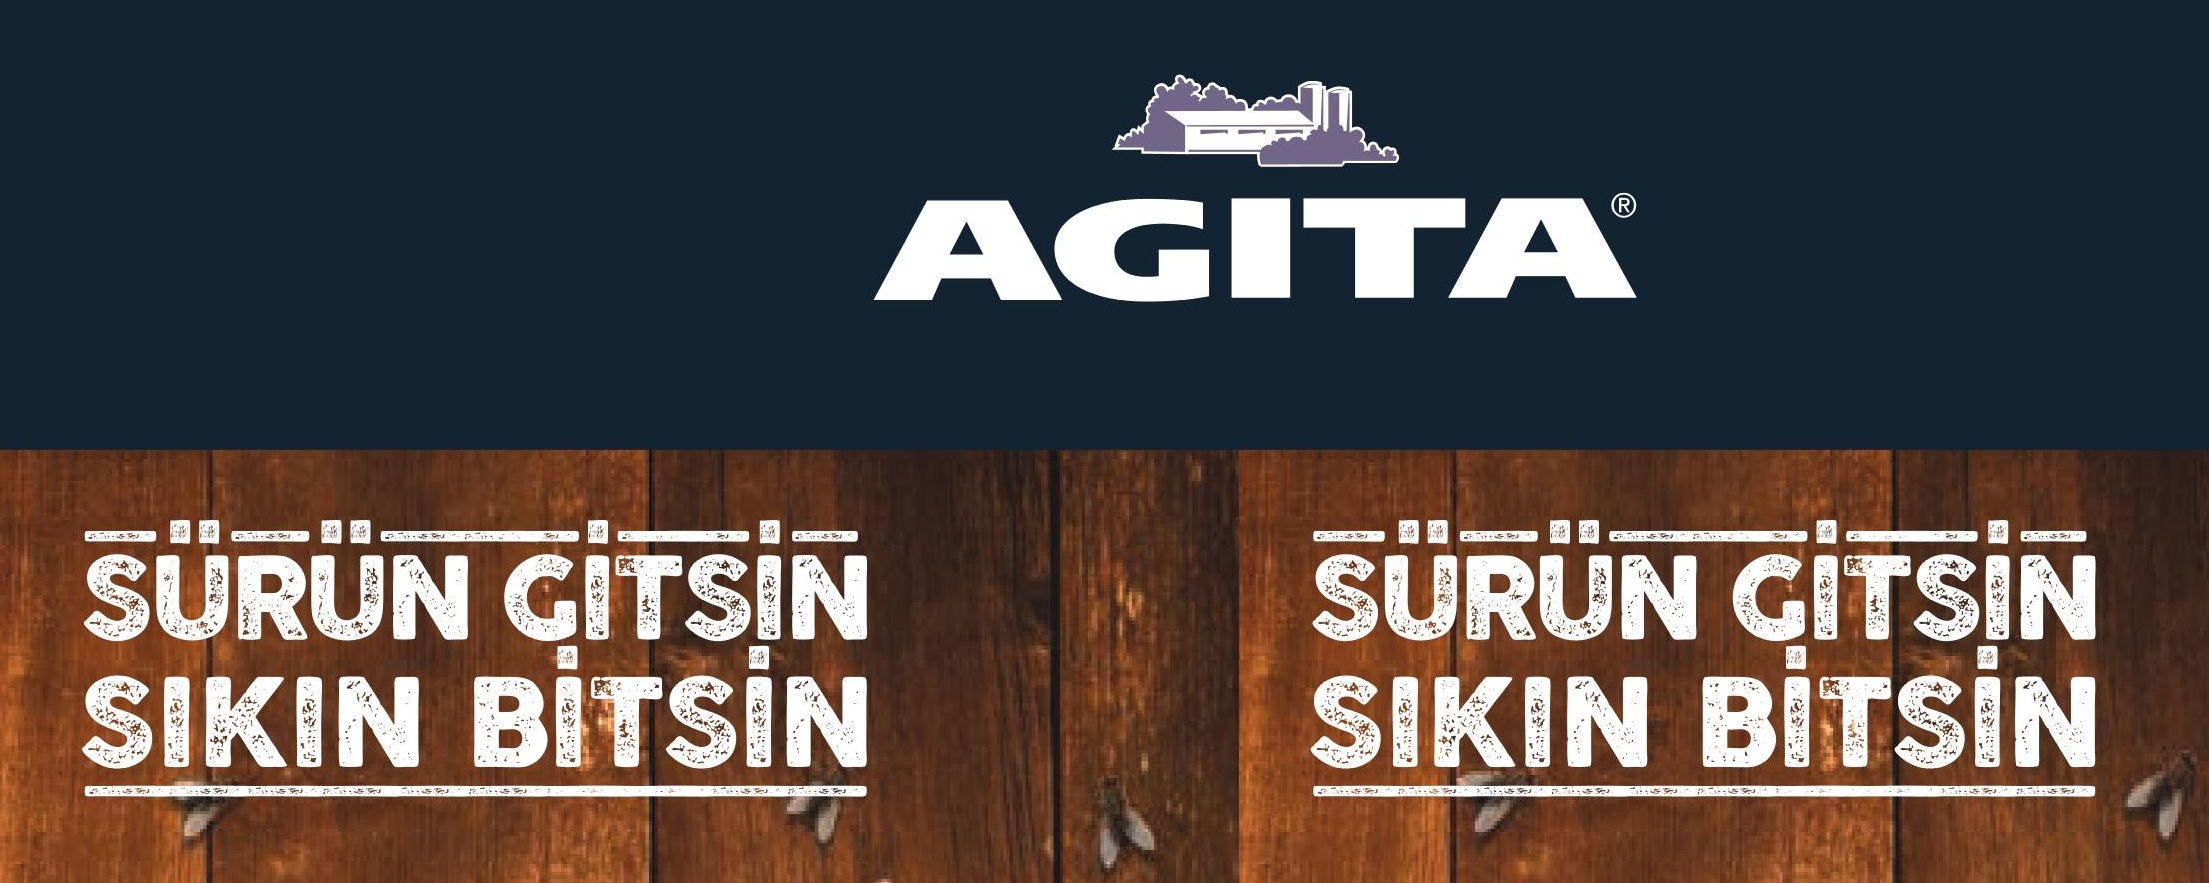 agita_1